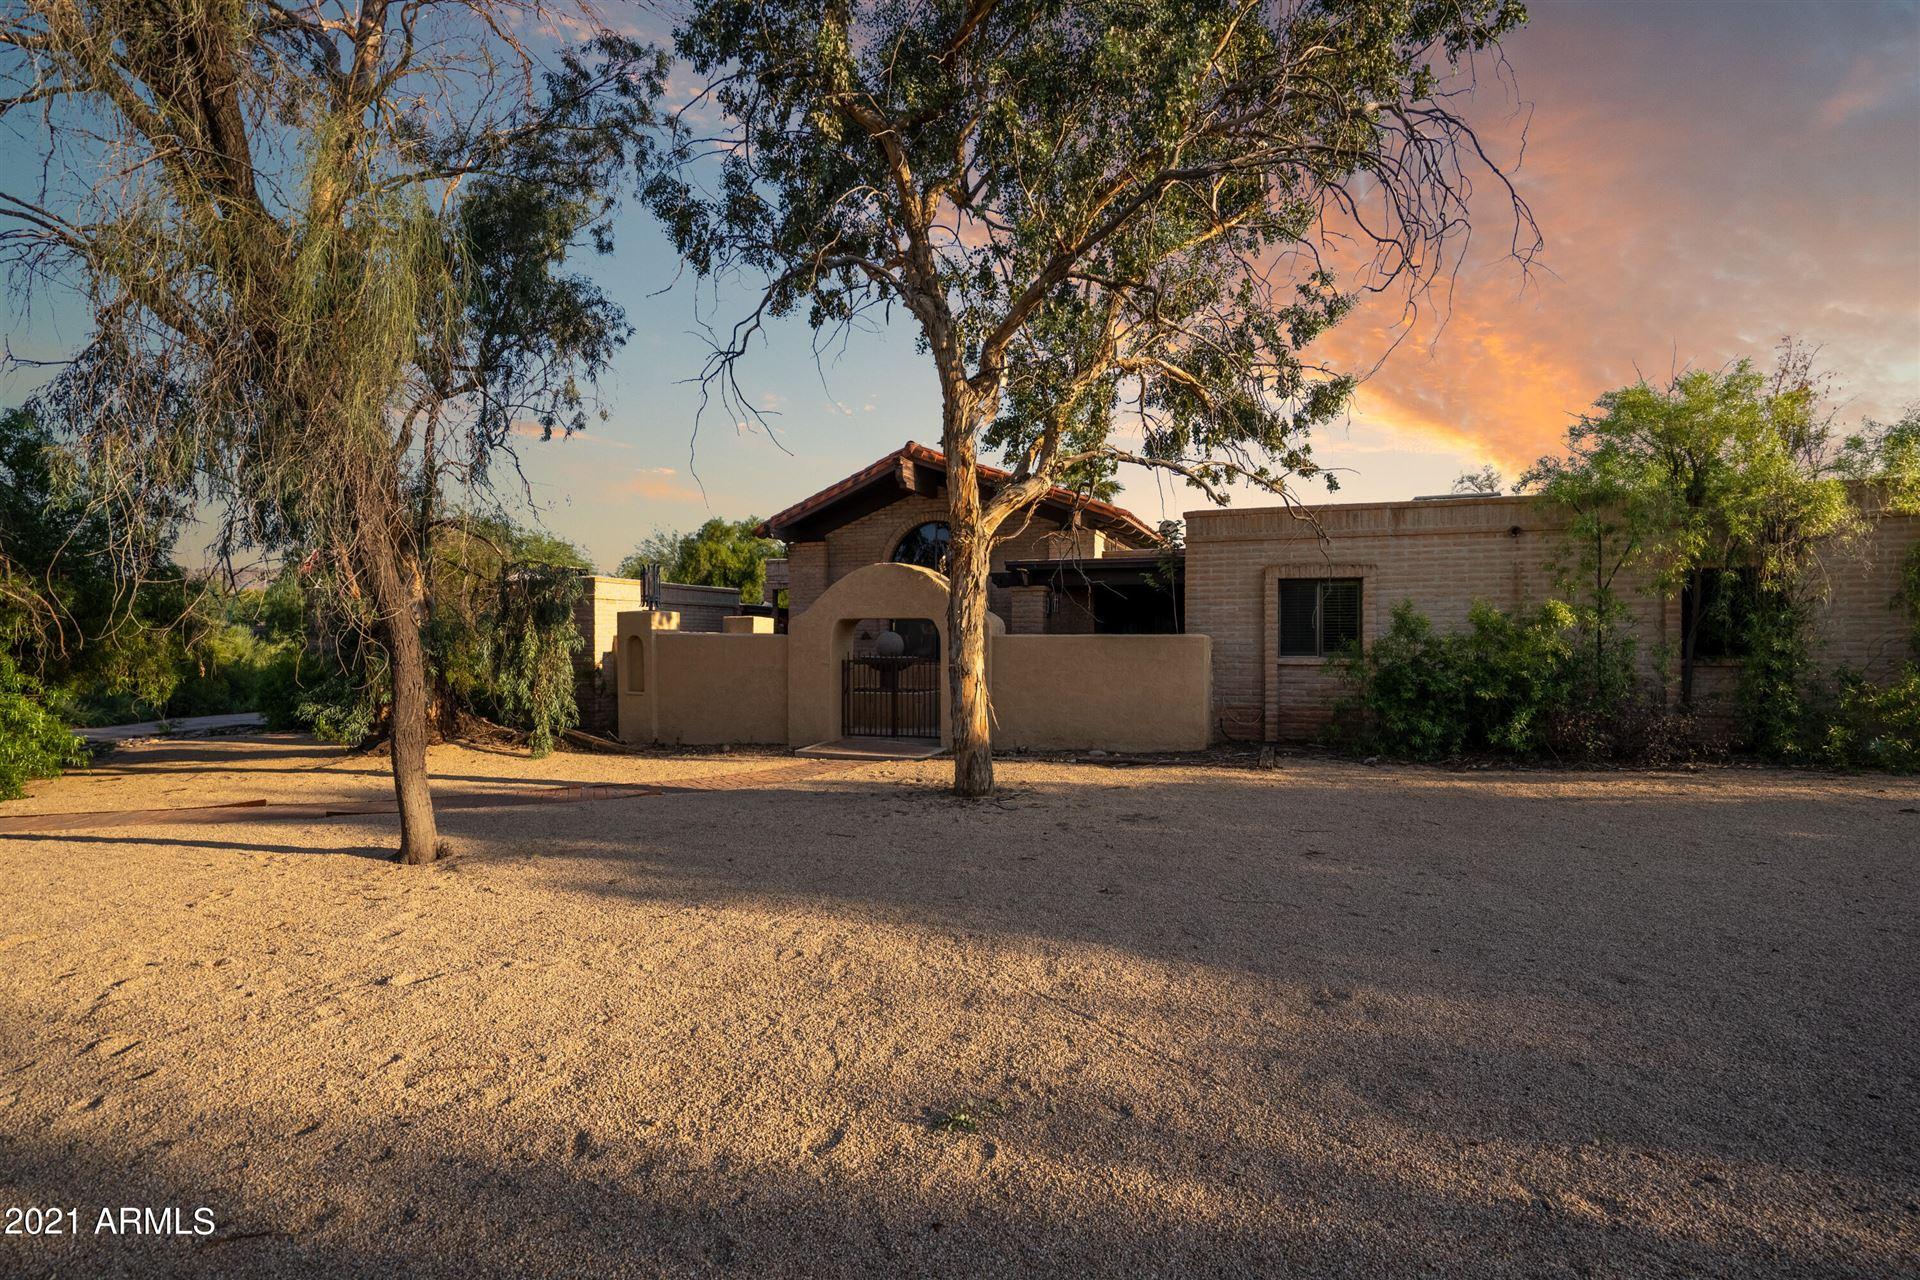 Photo of 2501 E MOUNTAIN VIEW Road, Phoenix, AZ 85028 (MLS # 6293052)